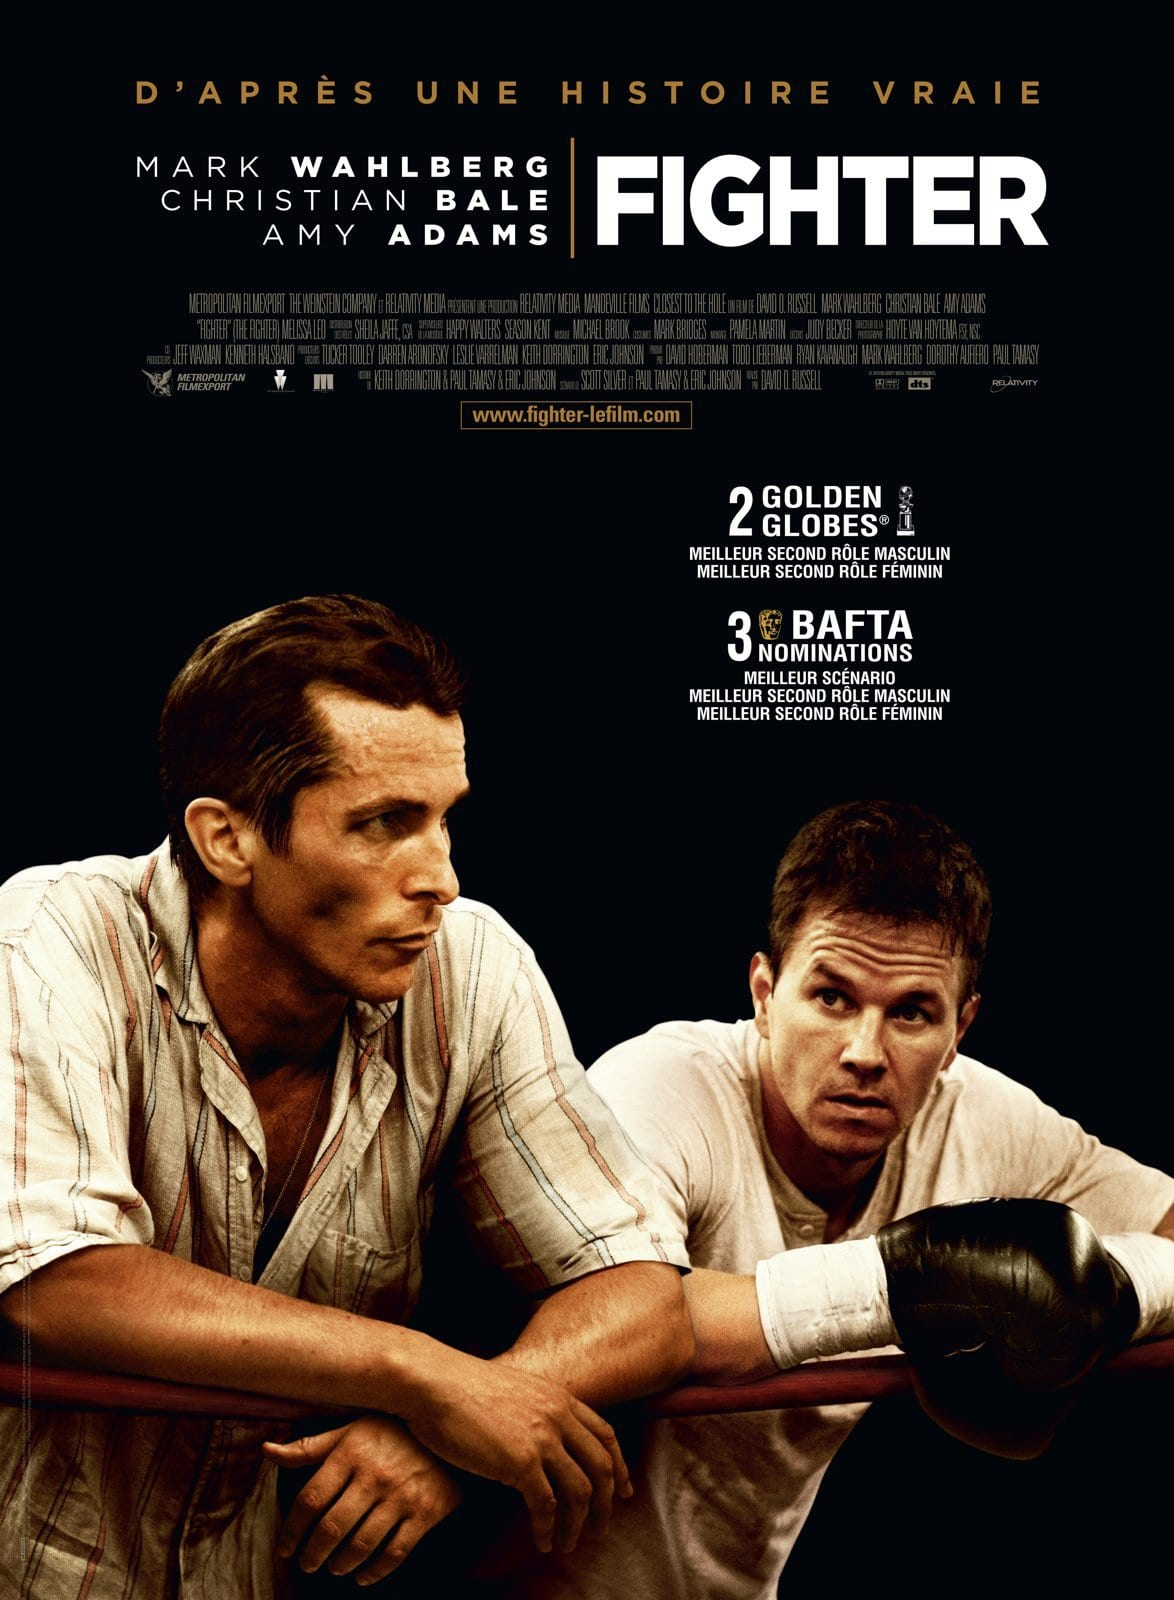 affiche du film Fighter